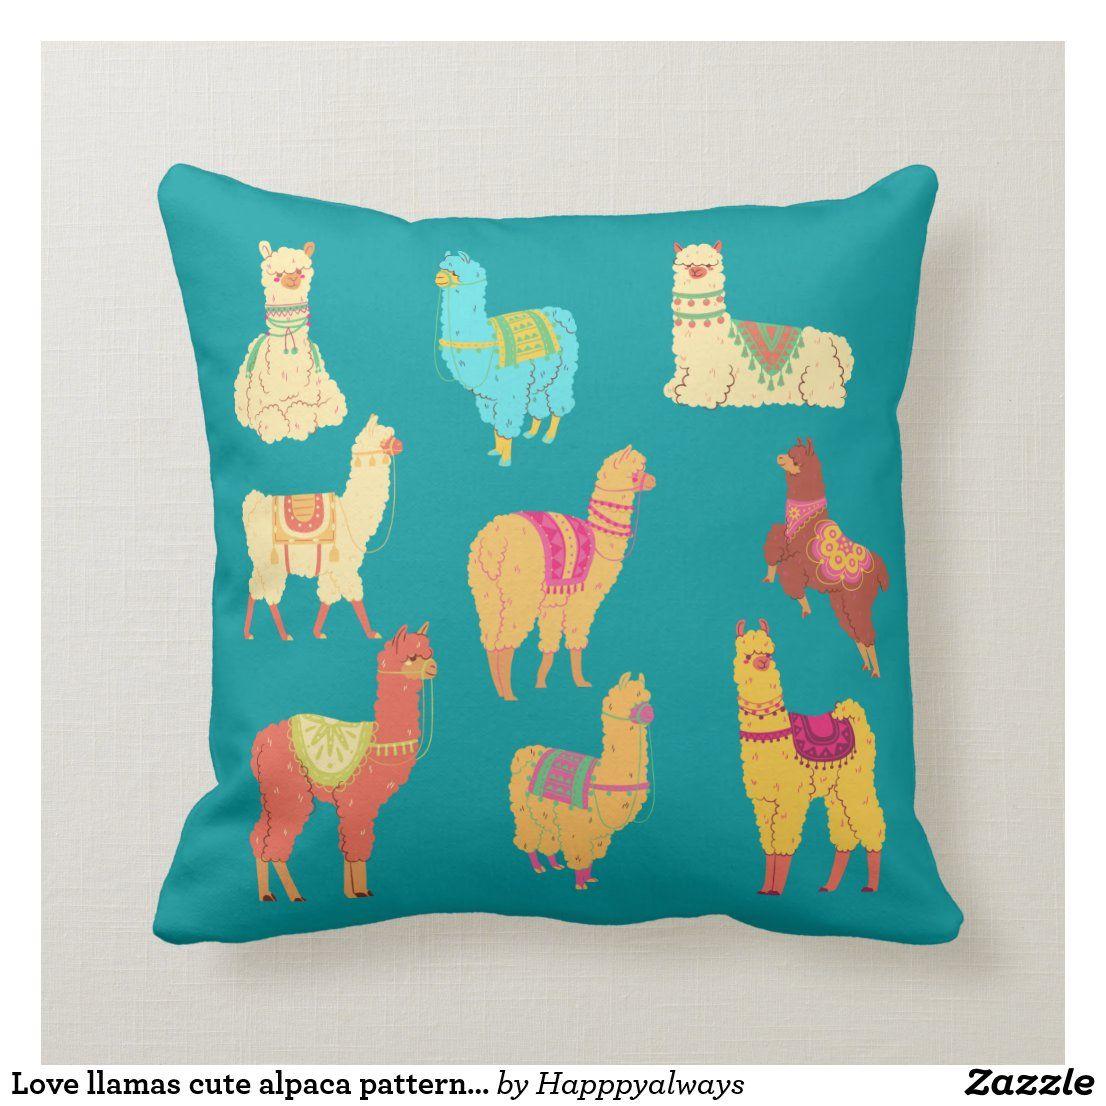 Cute Llamas South American Alpaca Animal Pattern Throw Pillow Zazzle Com In 2021 Throw Pillows Patterned Throw Pillows Alpaca Stuffed Animal